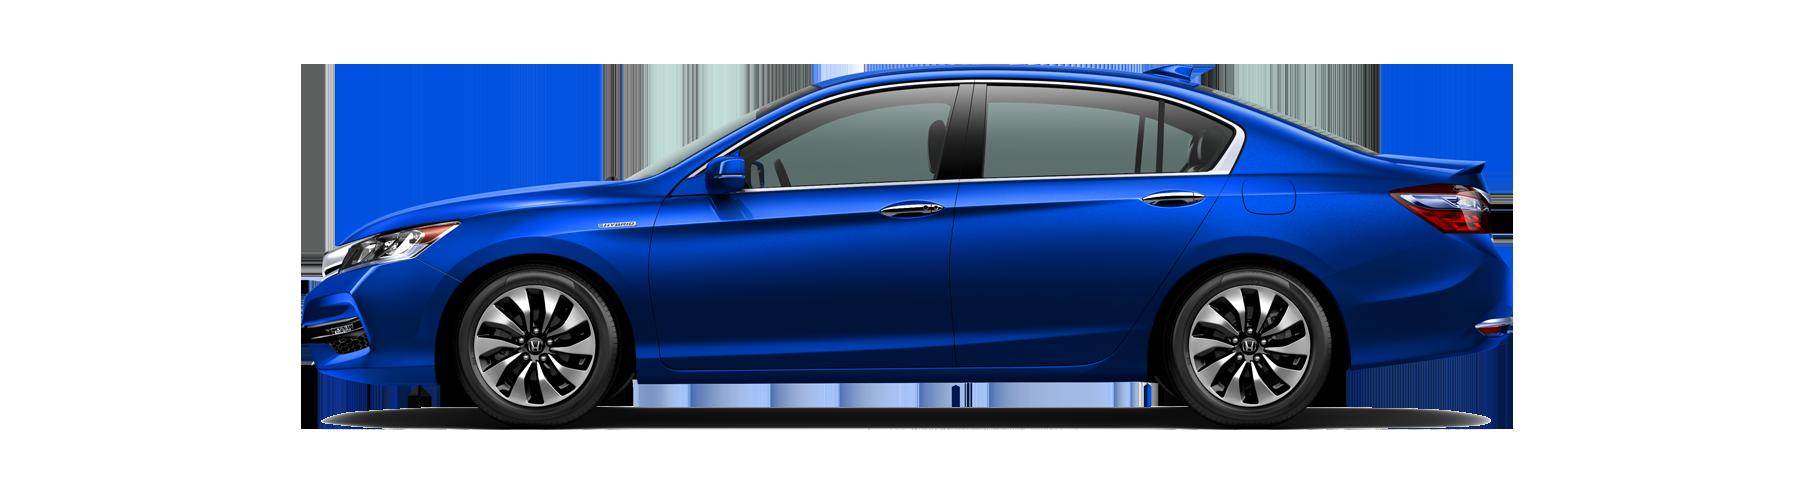 2017 Honda Accord Hybrid Side Profile